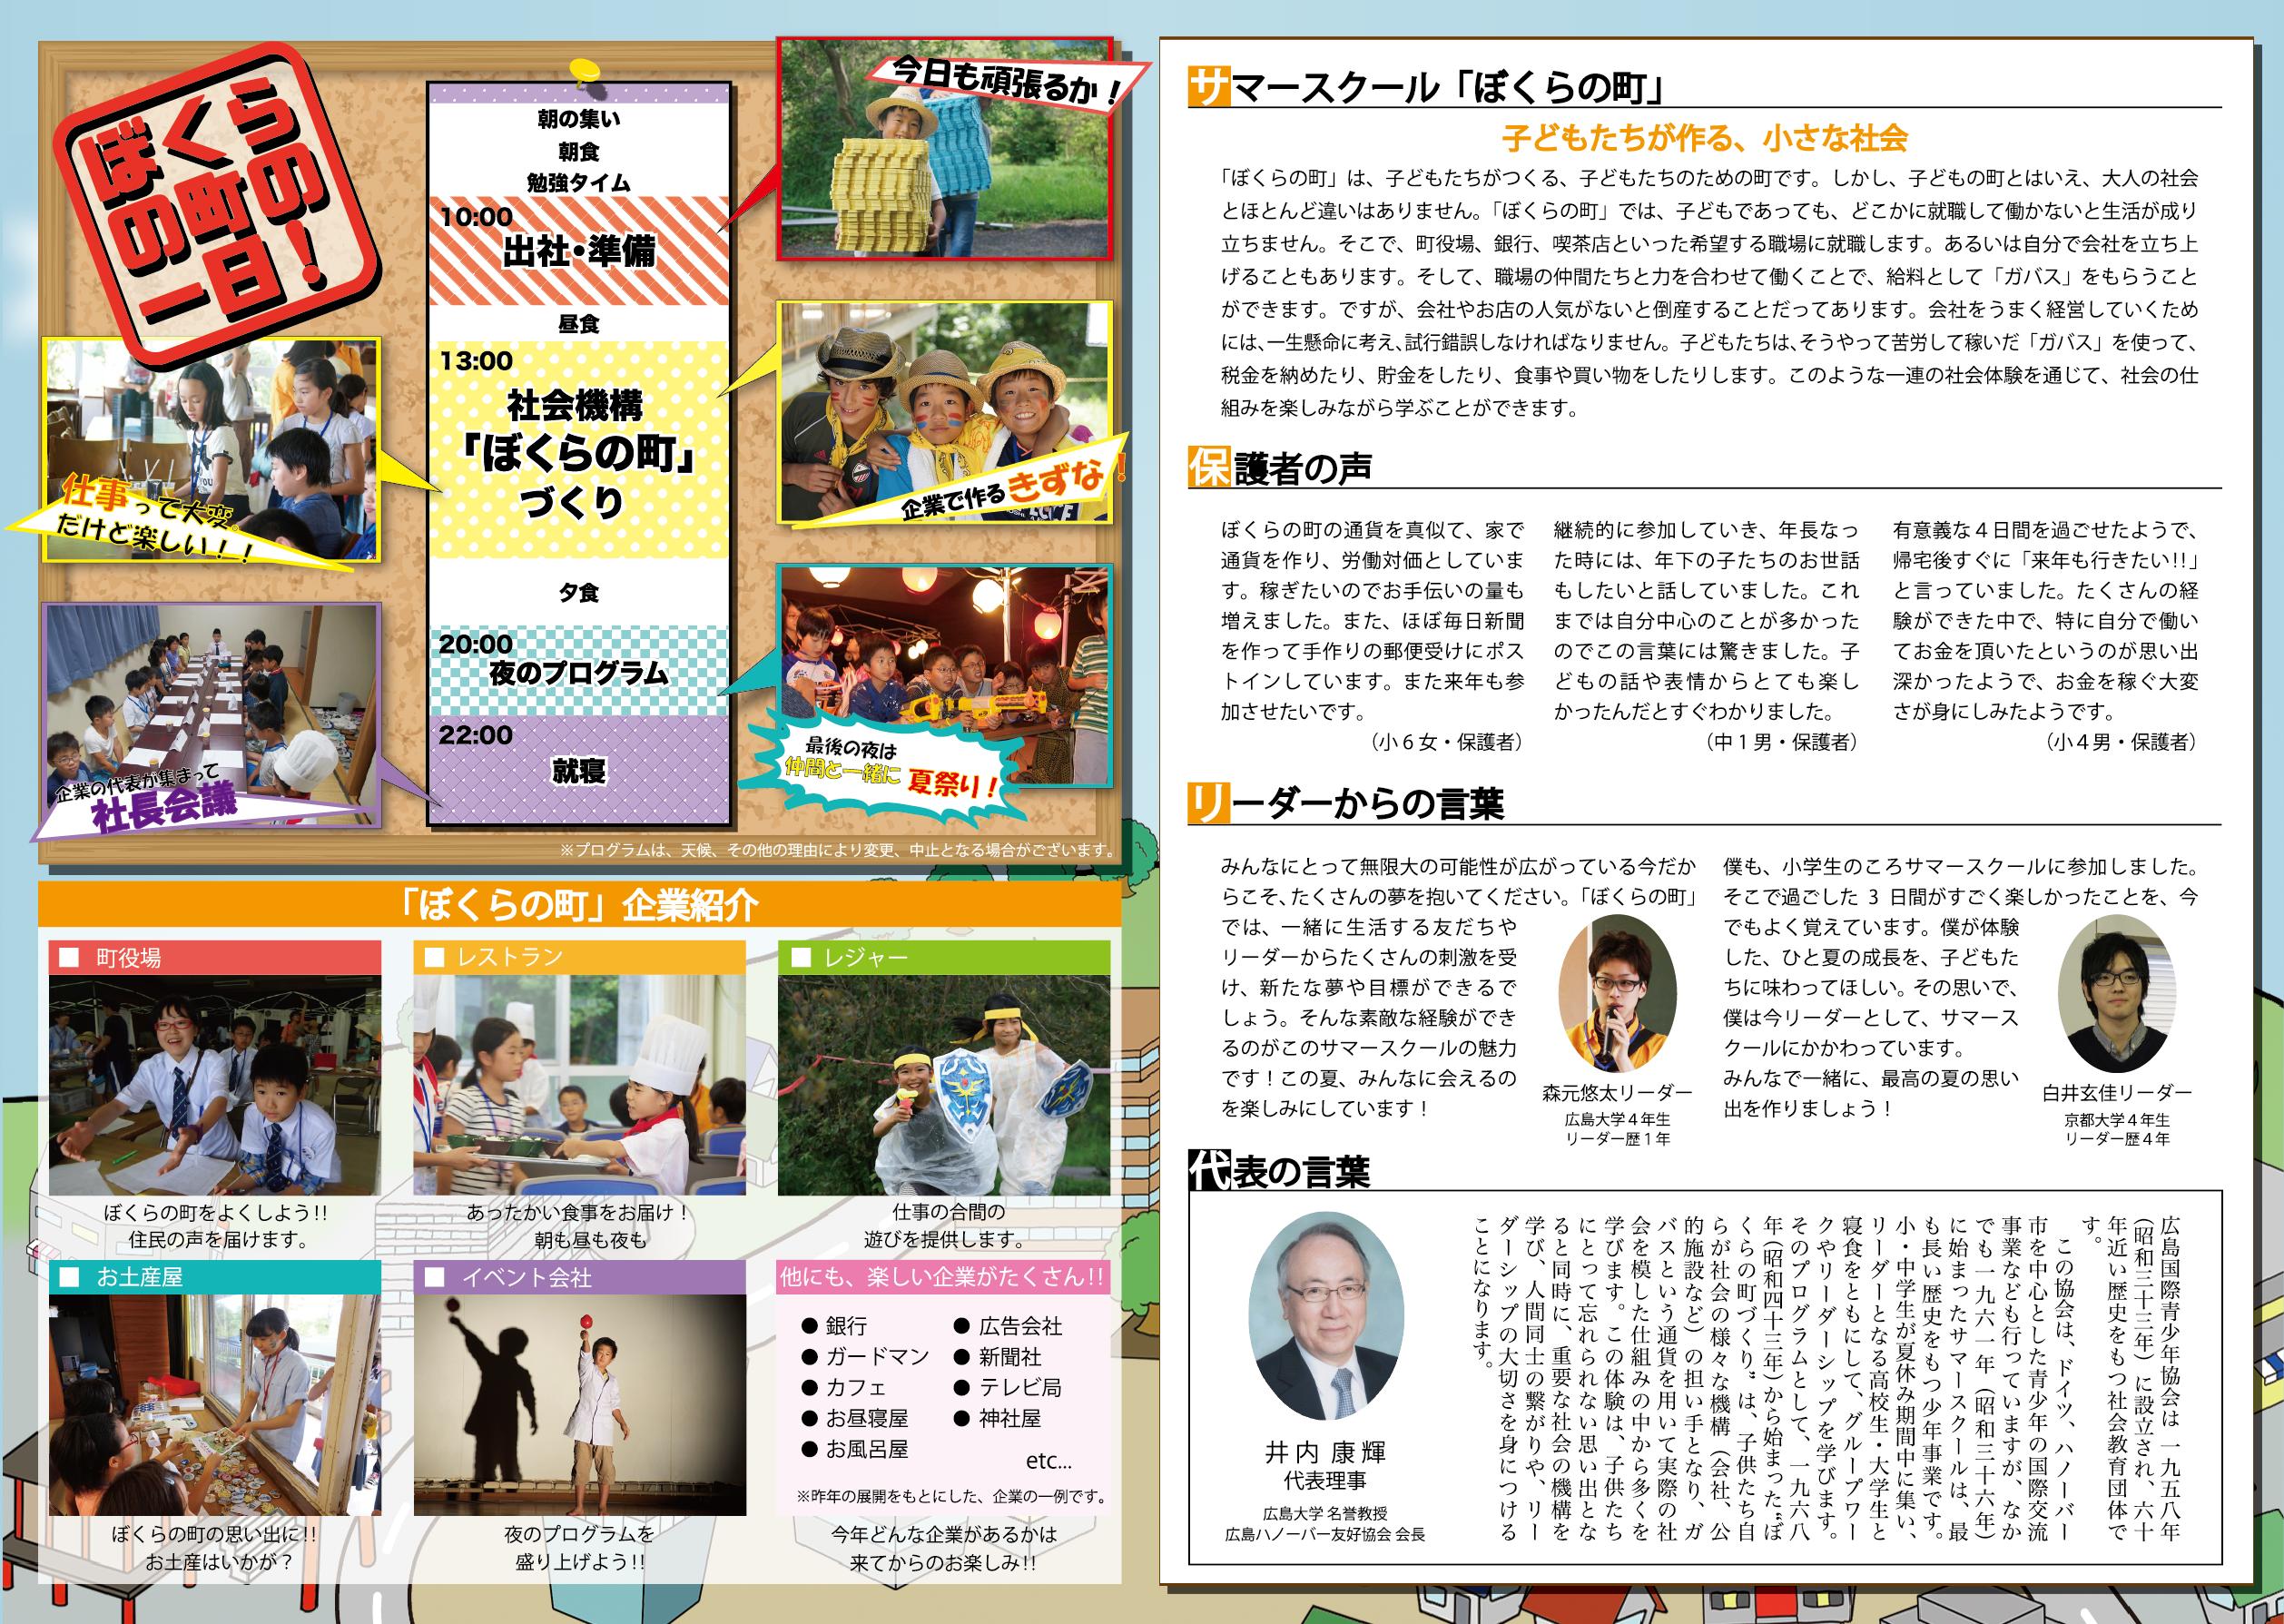 20150418_SS2015参加者募集パンフレット_-改_アウトライン化_中島-01.png